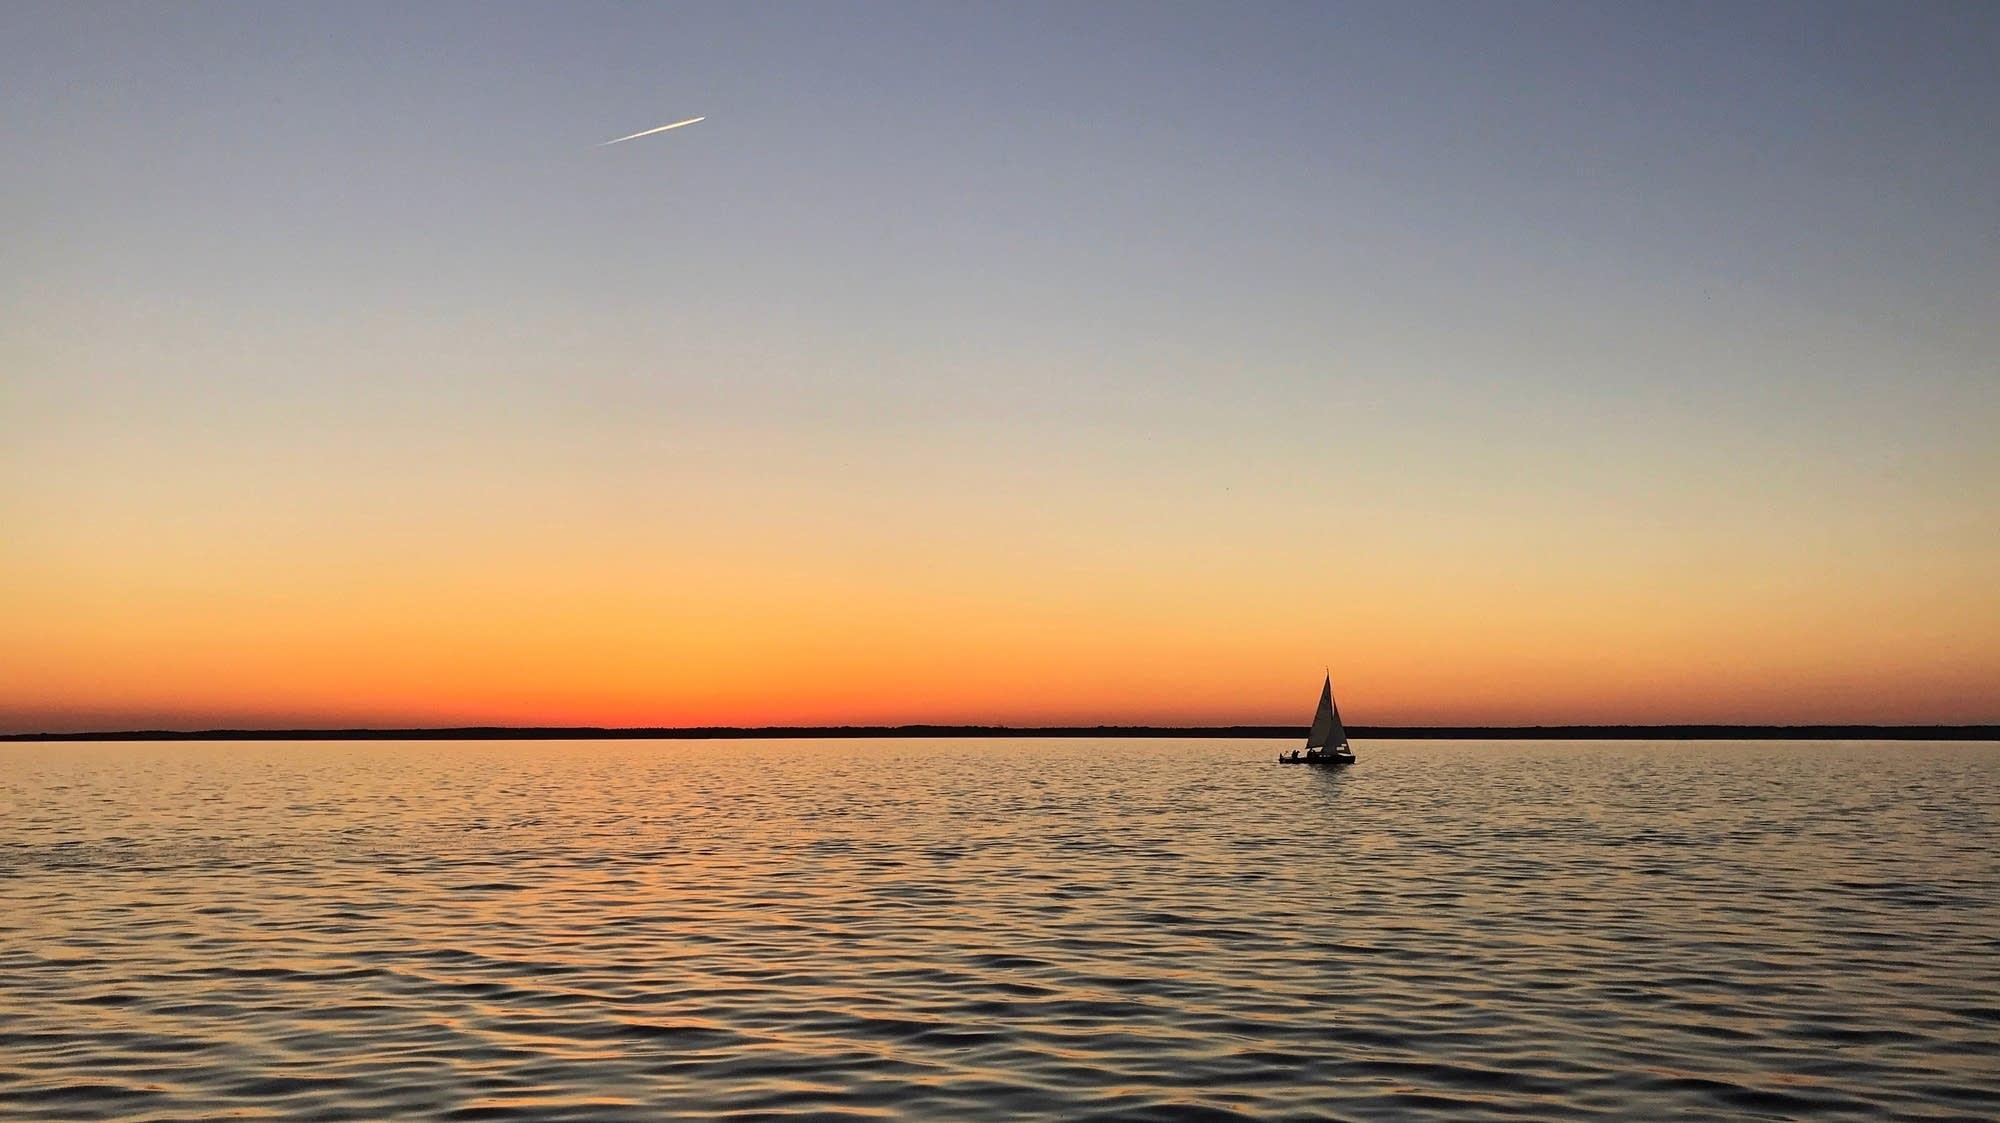 A lone sailboat floats on a calm sea.